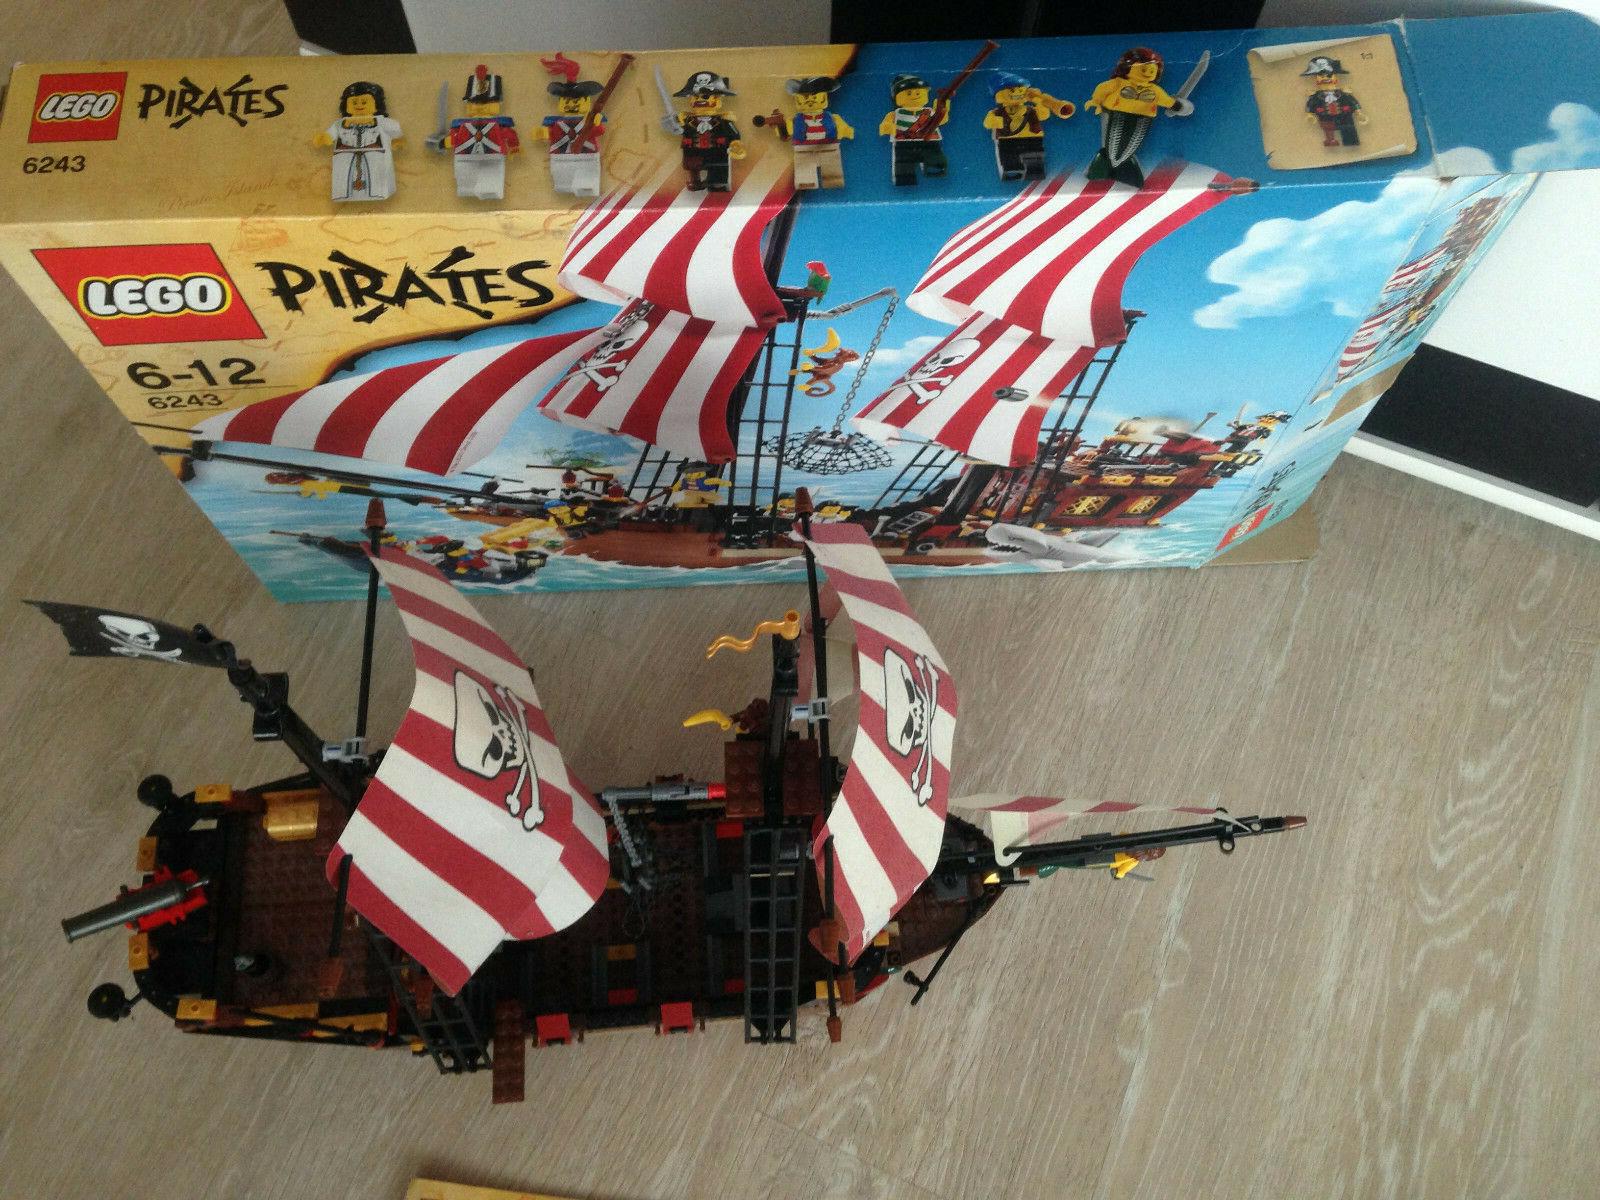 Lego Pirates gran barco pirata (6243) como nuevo + embalaje original + ba + 100% completo